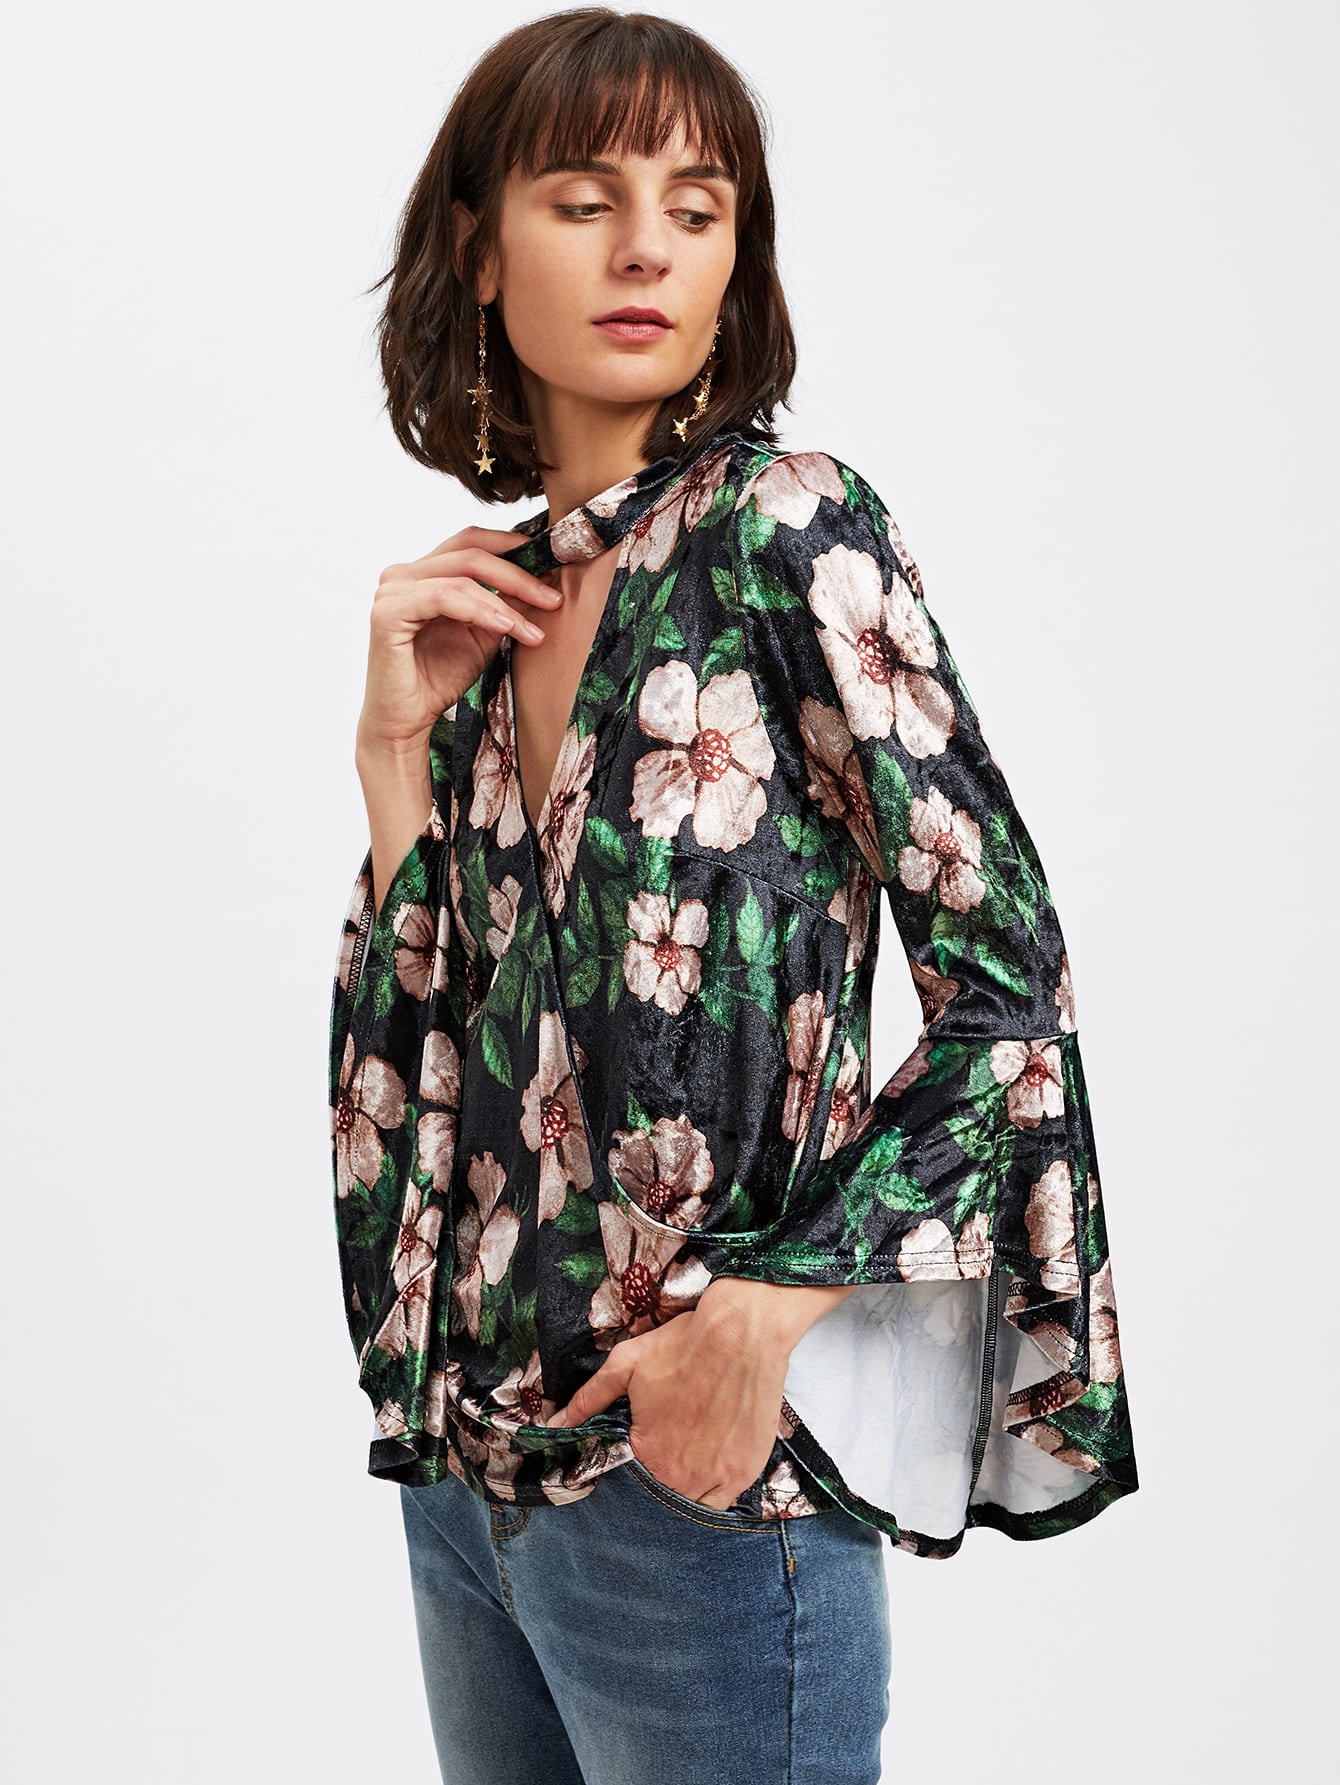 Choker Neck Trumpet Sleeve Floral Velvet Wrap Top choker neck bishop sleeve floral top